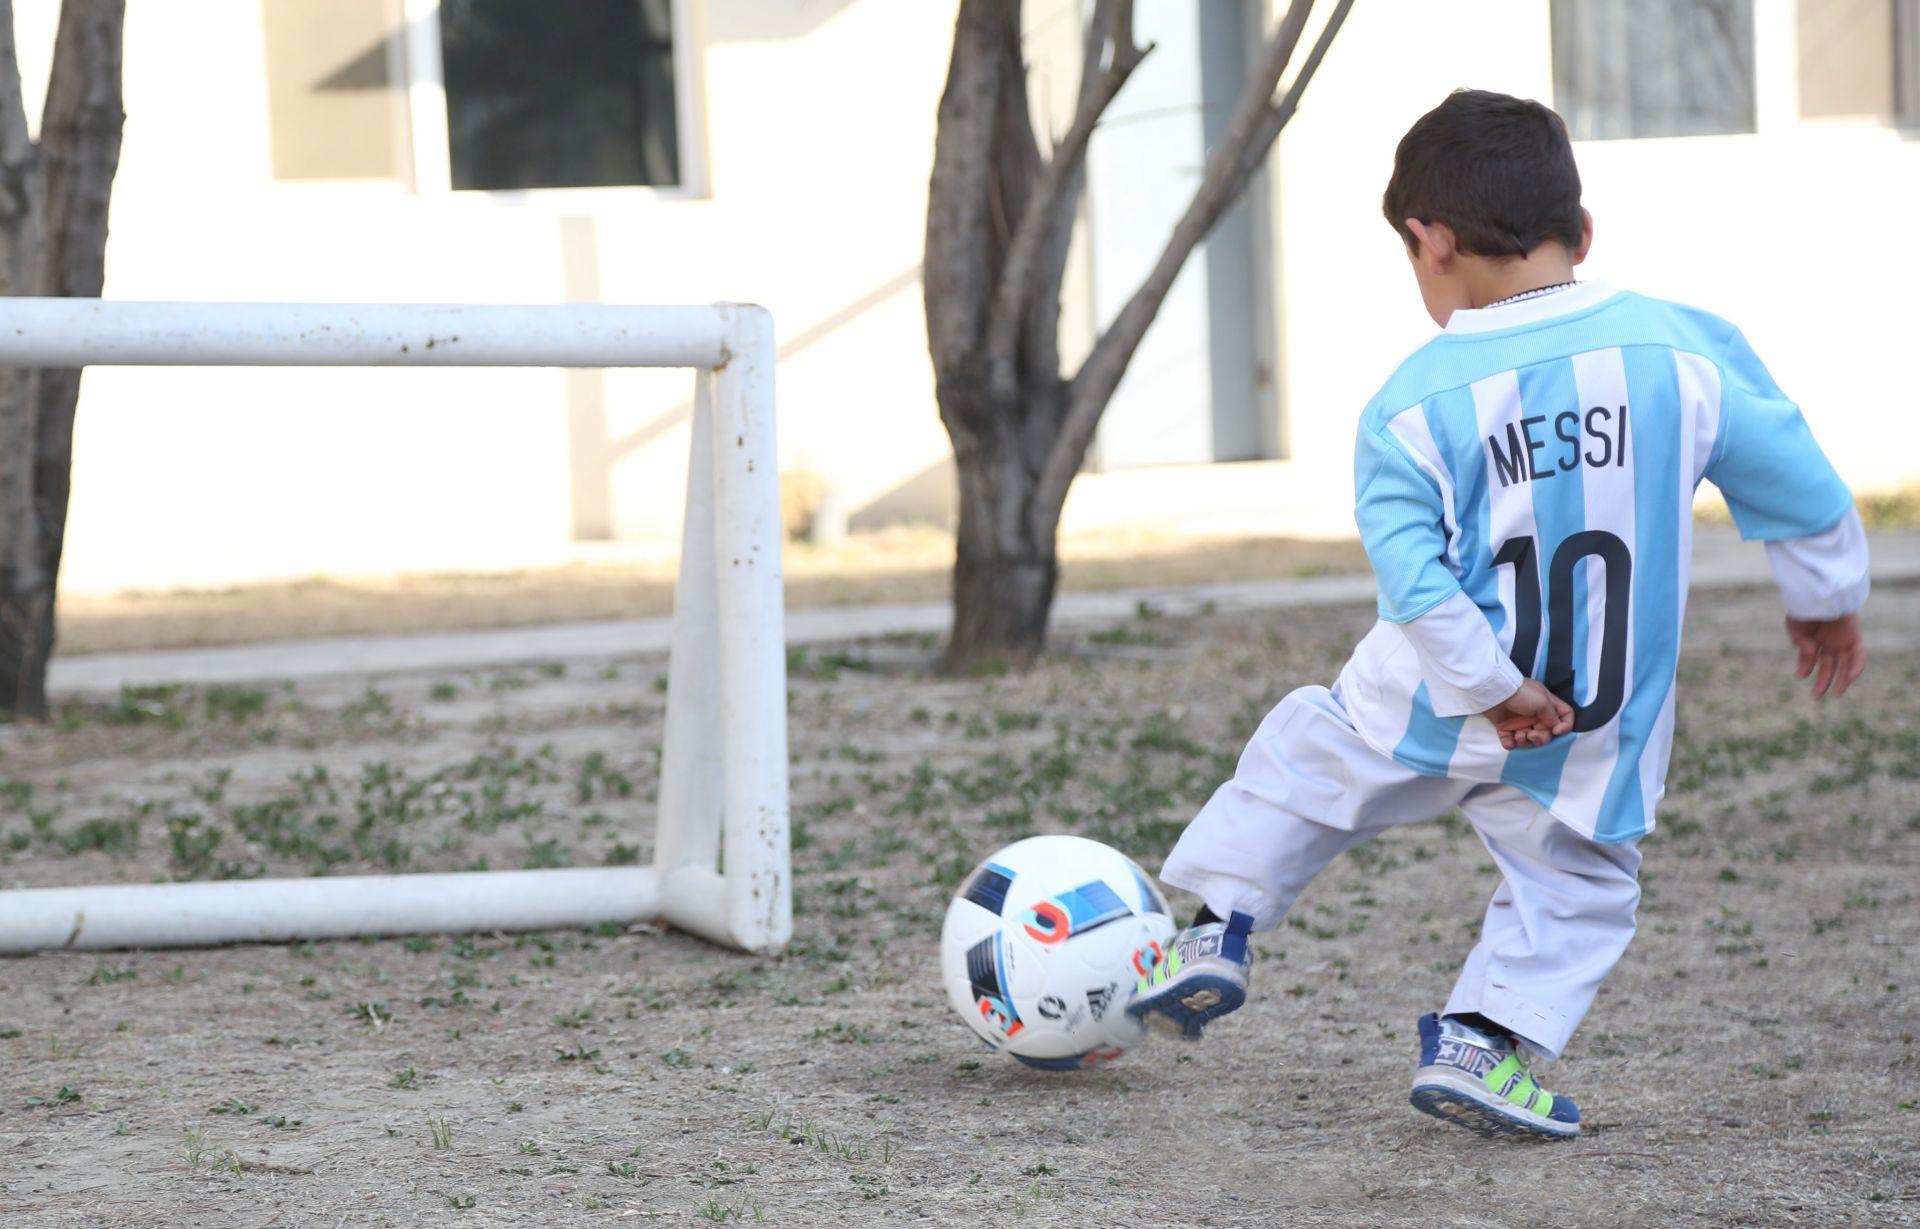 EPA/MAHDY MEHRAEEN/UNICEF